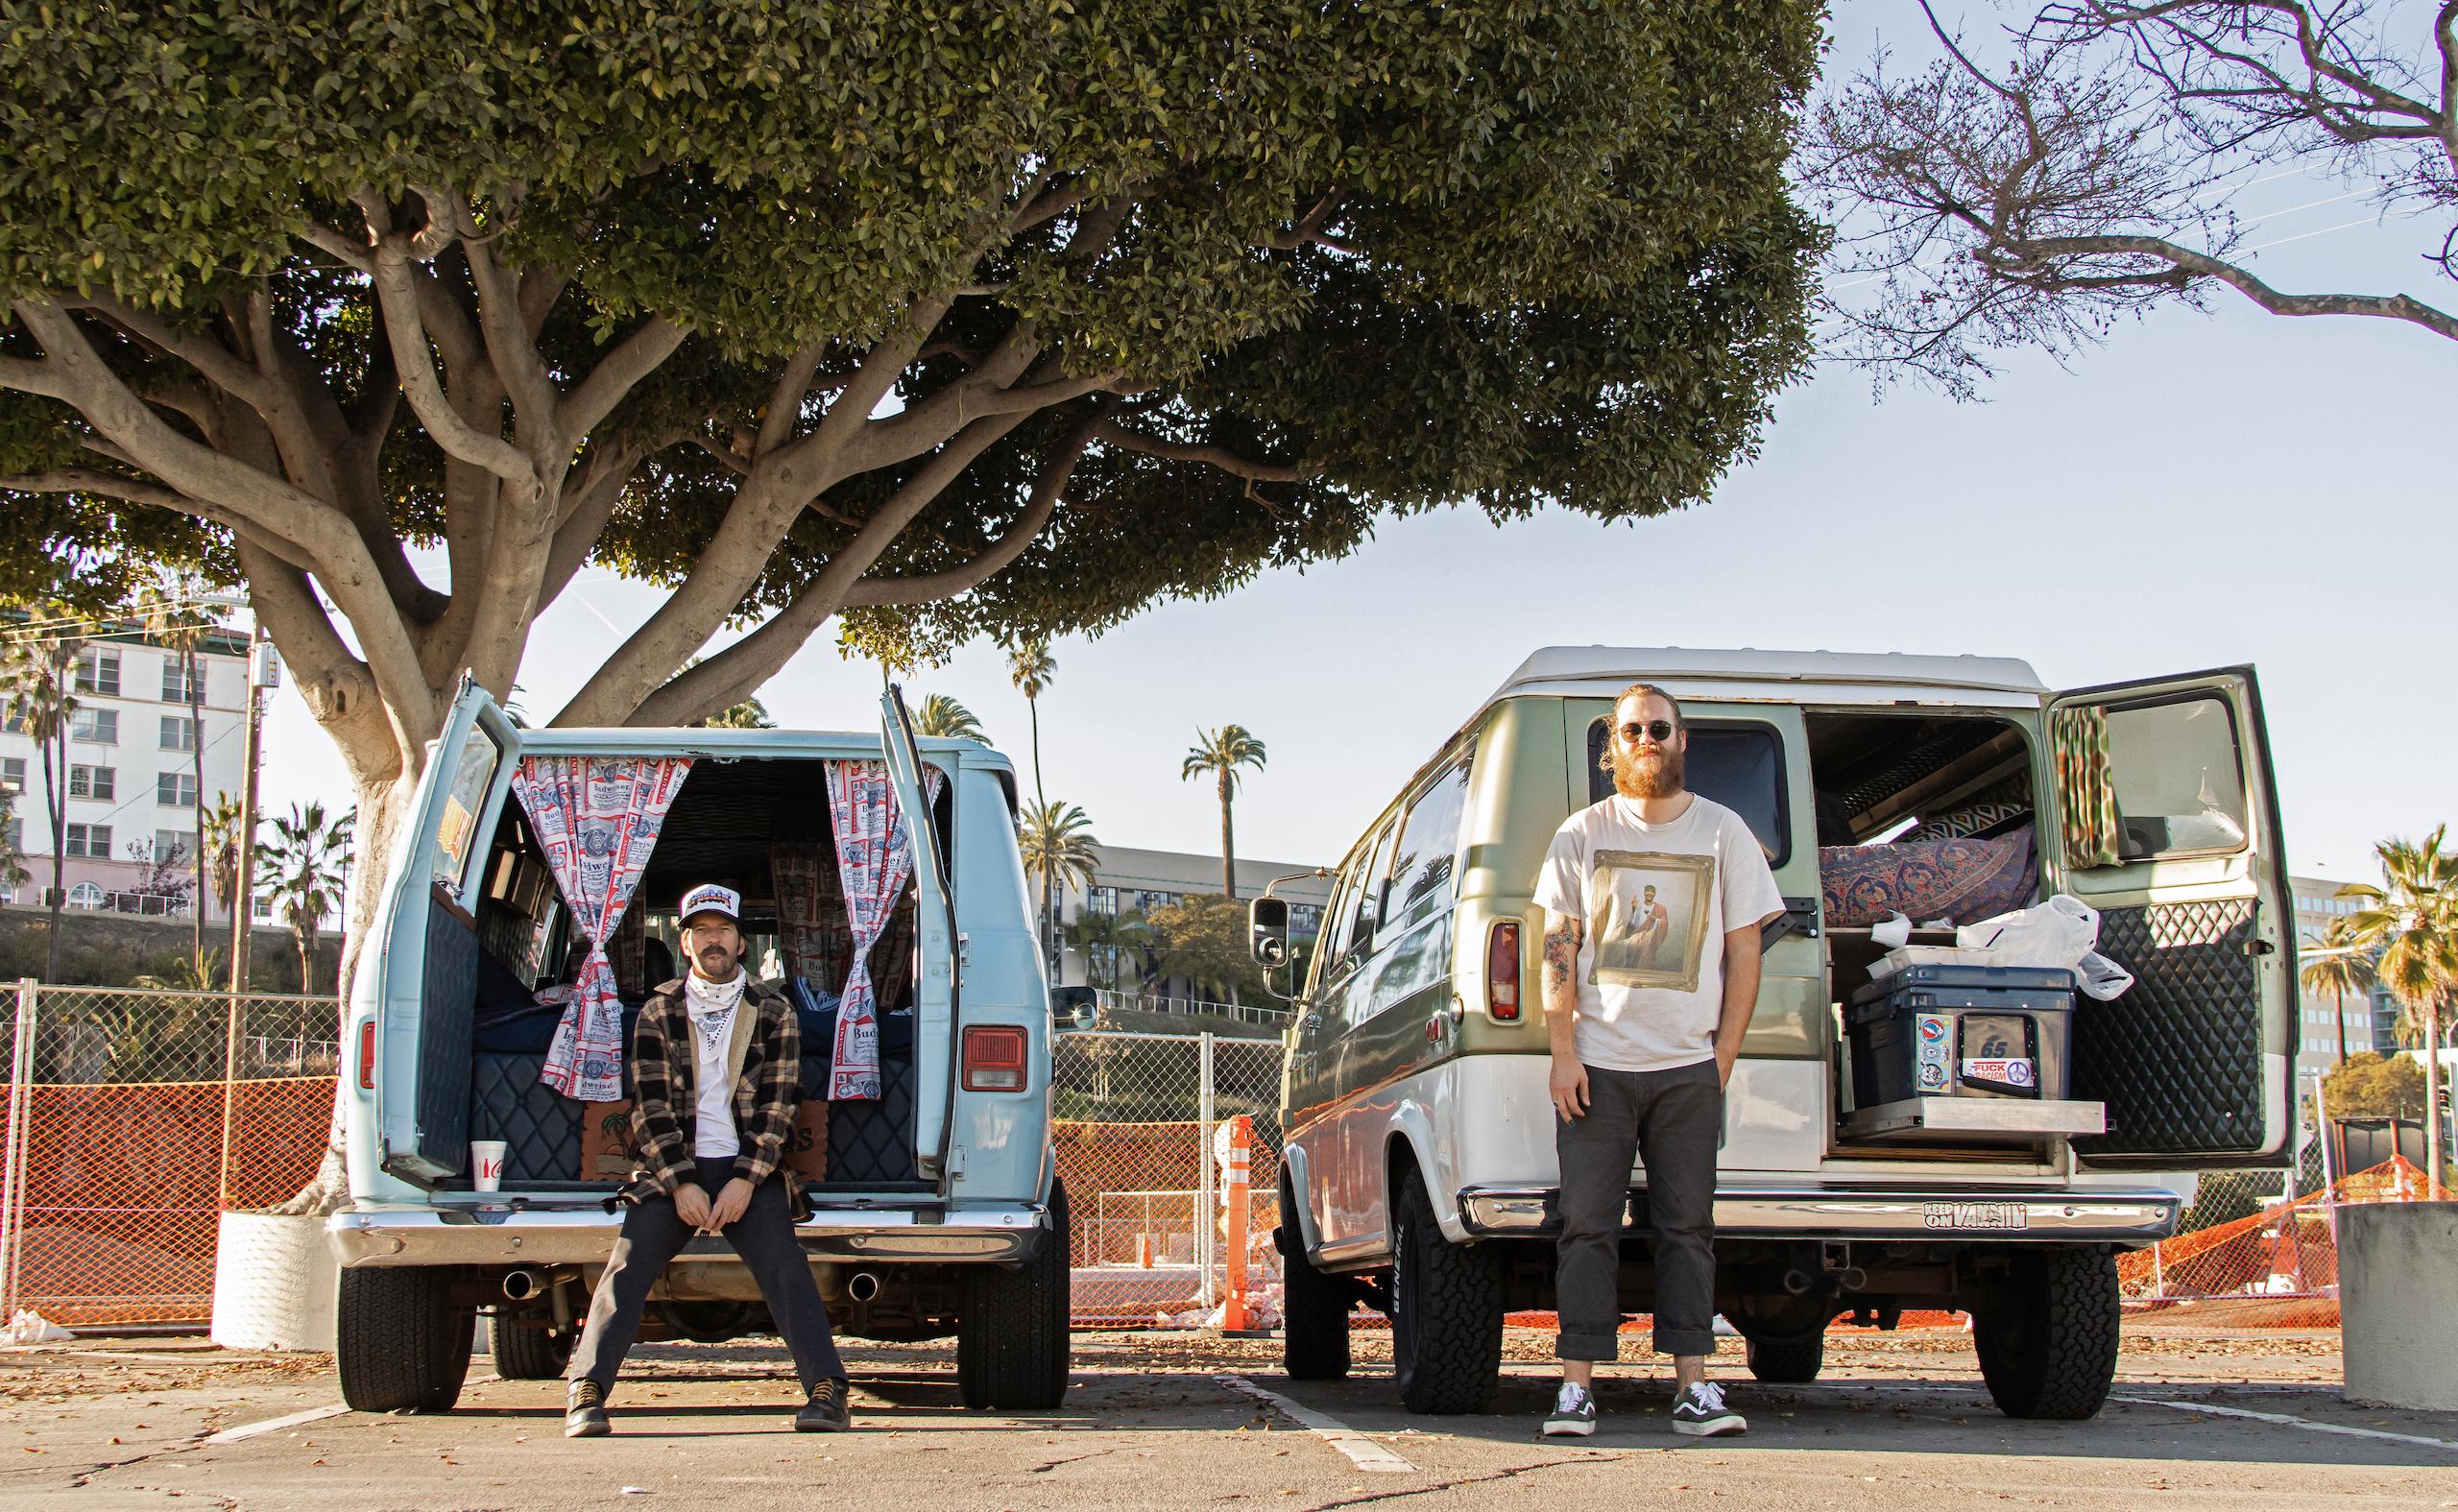 So-Cal Slow Ride Van Run nomads